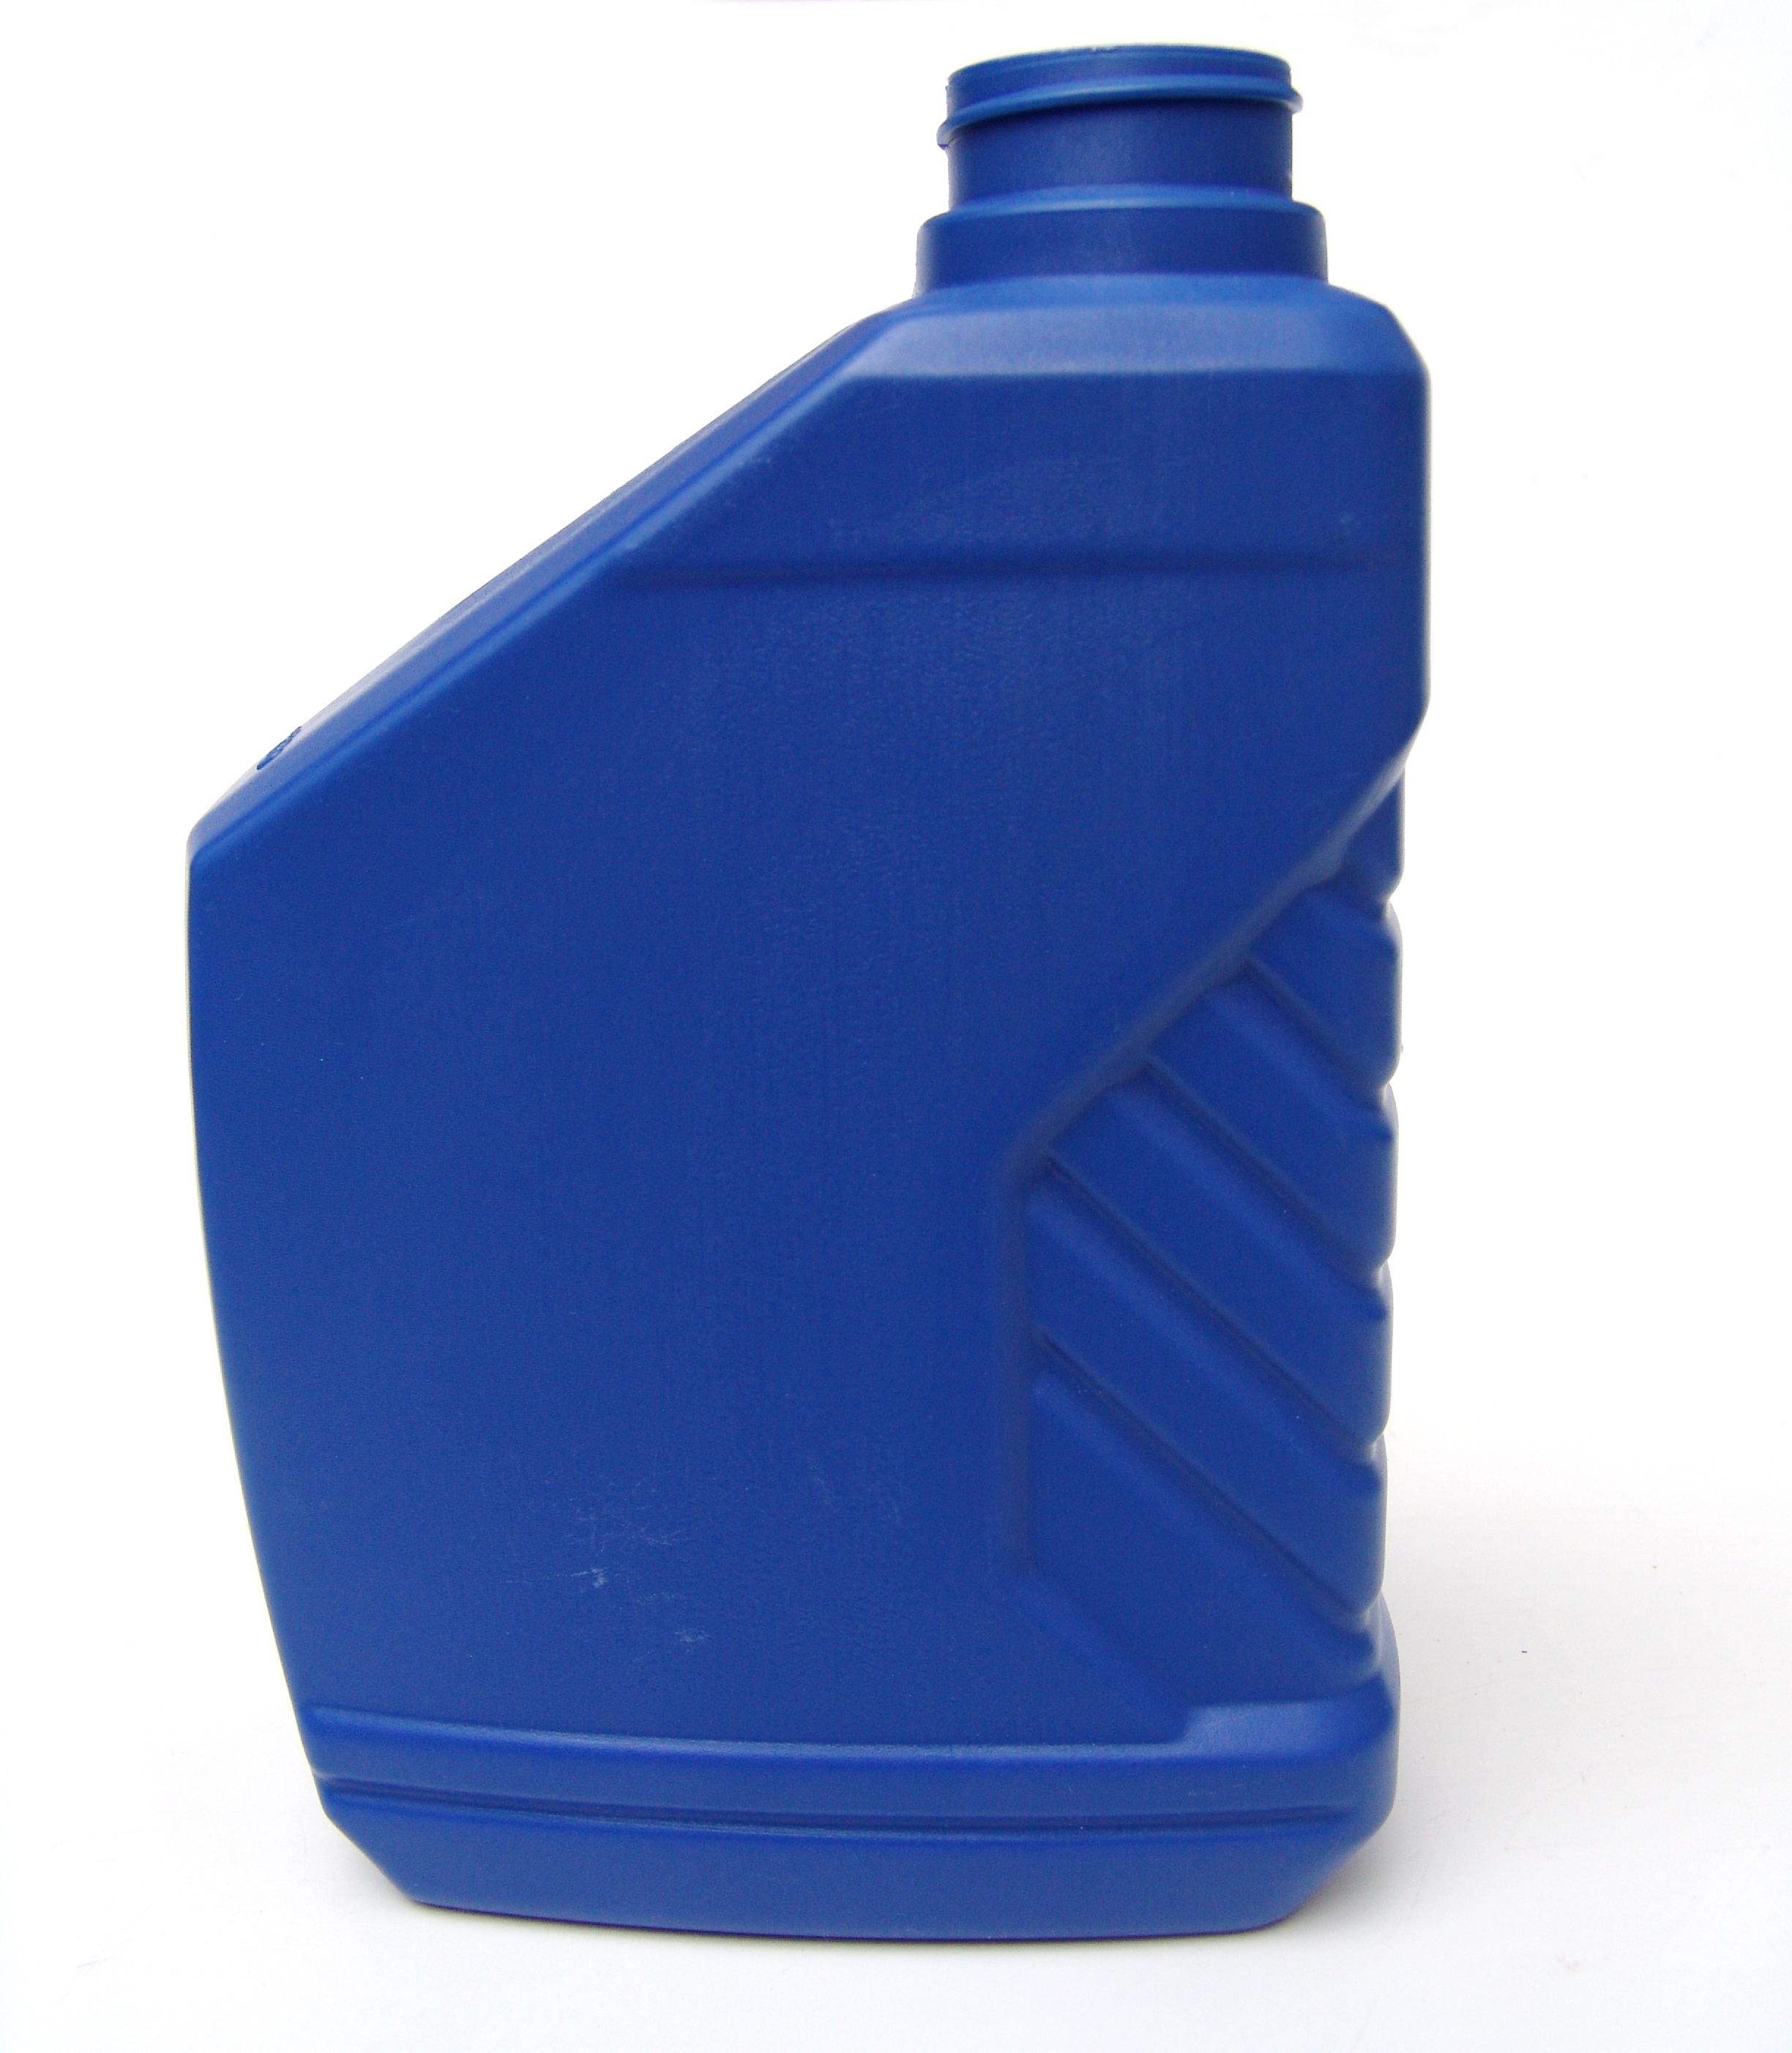 Polyethylene | Packaging Supplies Blog - U.S. Packaging ... Polyethylene Plastic